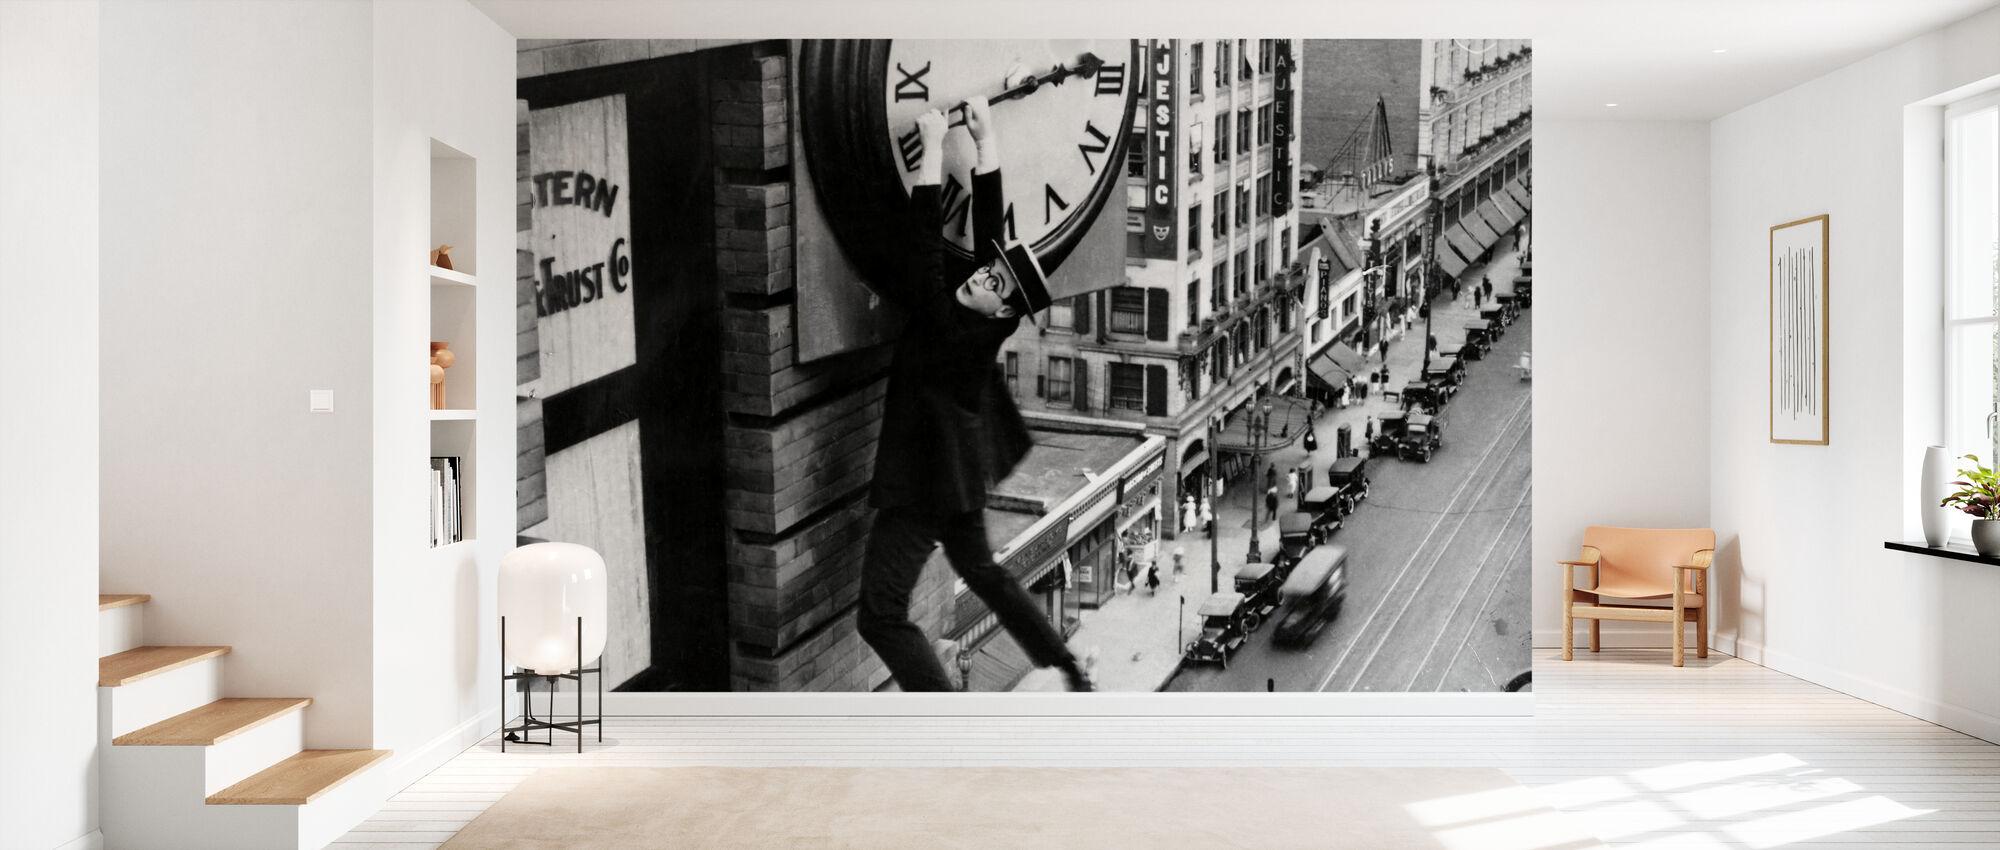 Harold Lloyd in Safety Last - Wallpaper - Hallway